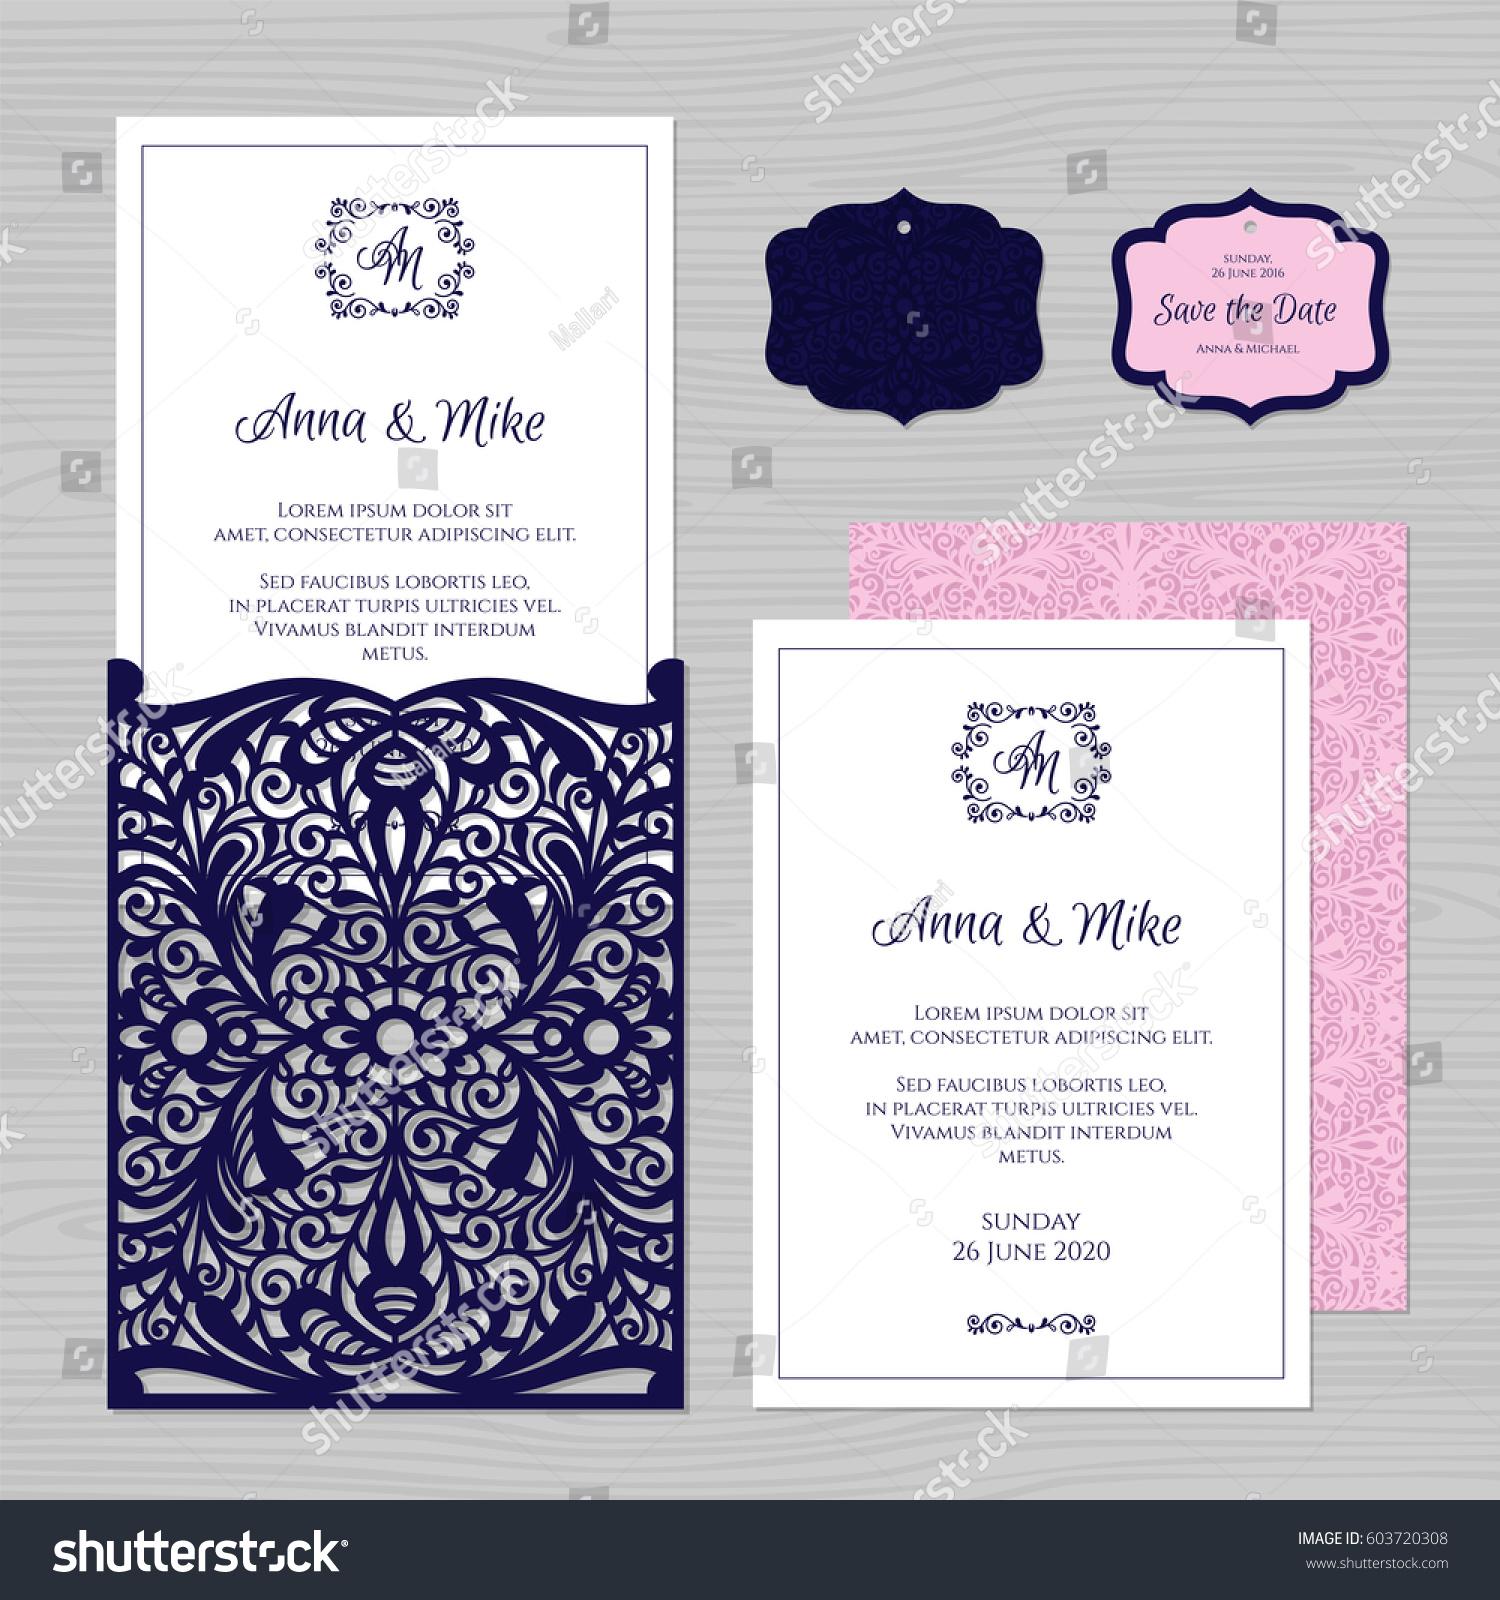 Wedding Invitation Greeting Card Vintage Ornament Stock Vector ...